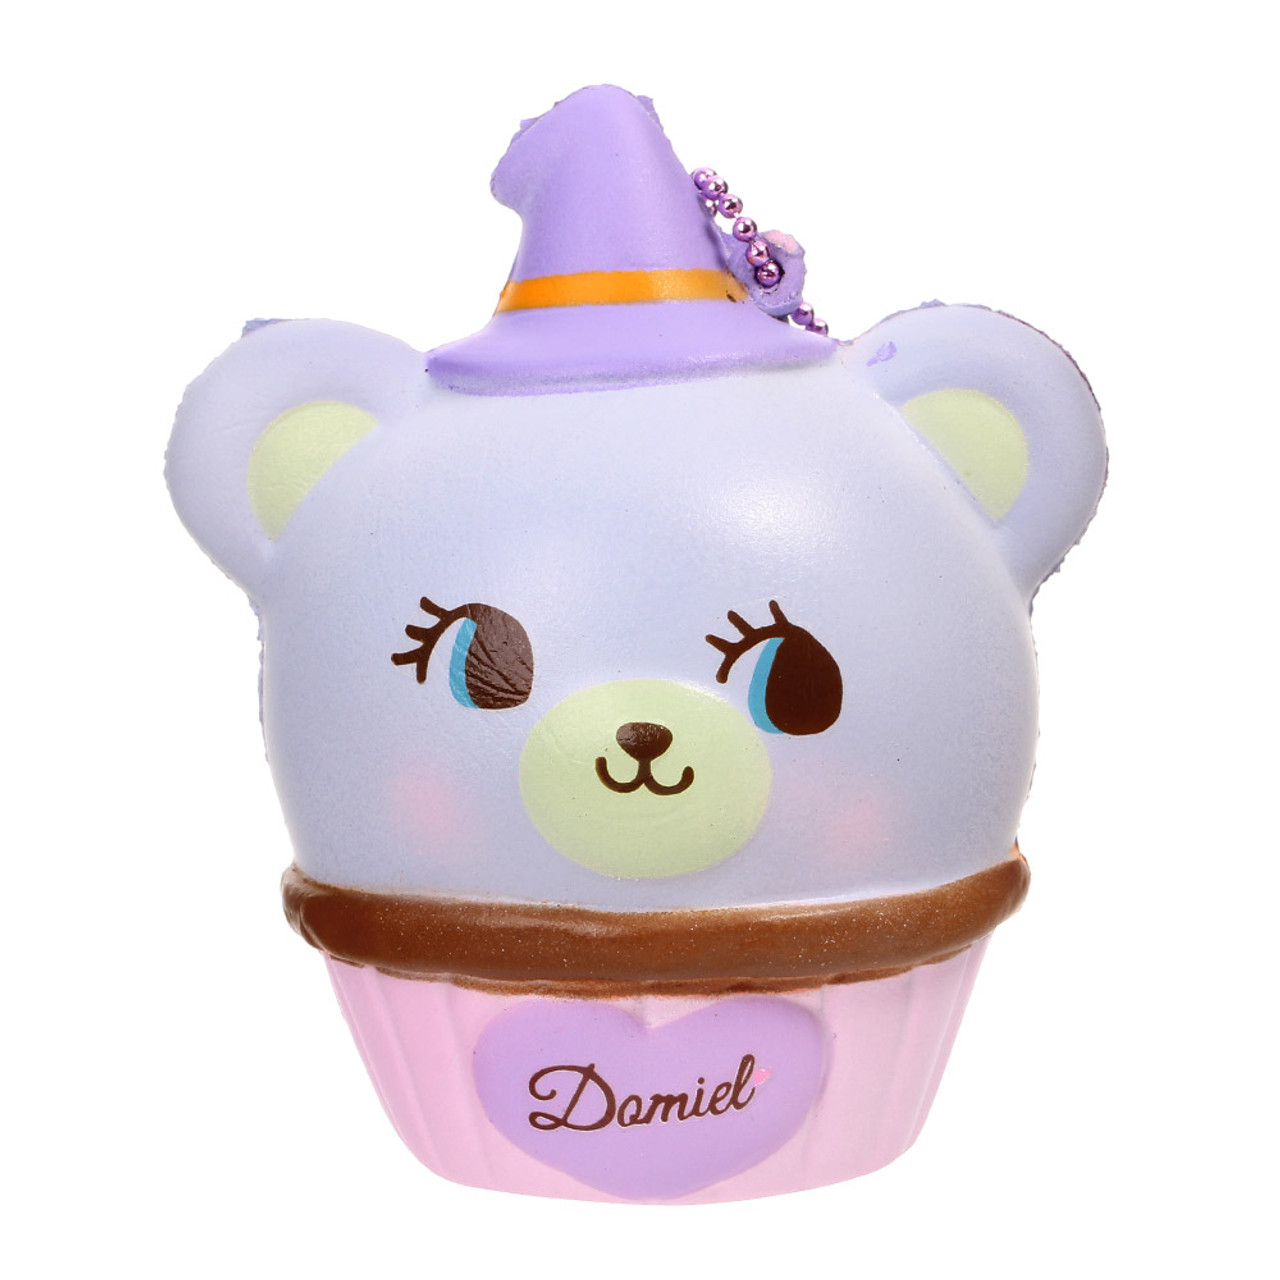 NIC Domiel Hug Me Purple Bear Cupcake Halloween Squishy Toy Charm ( Front View )